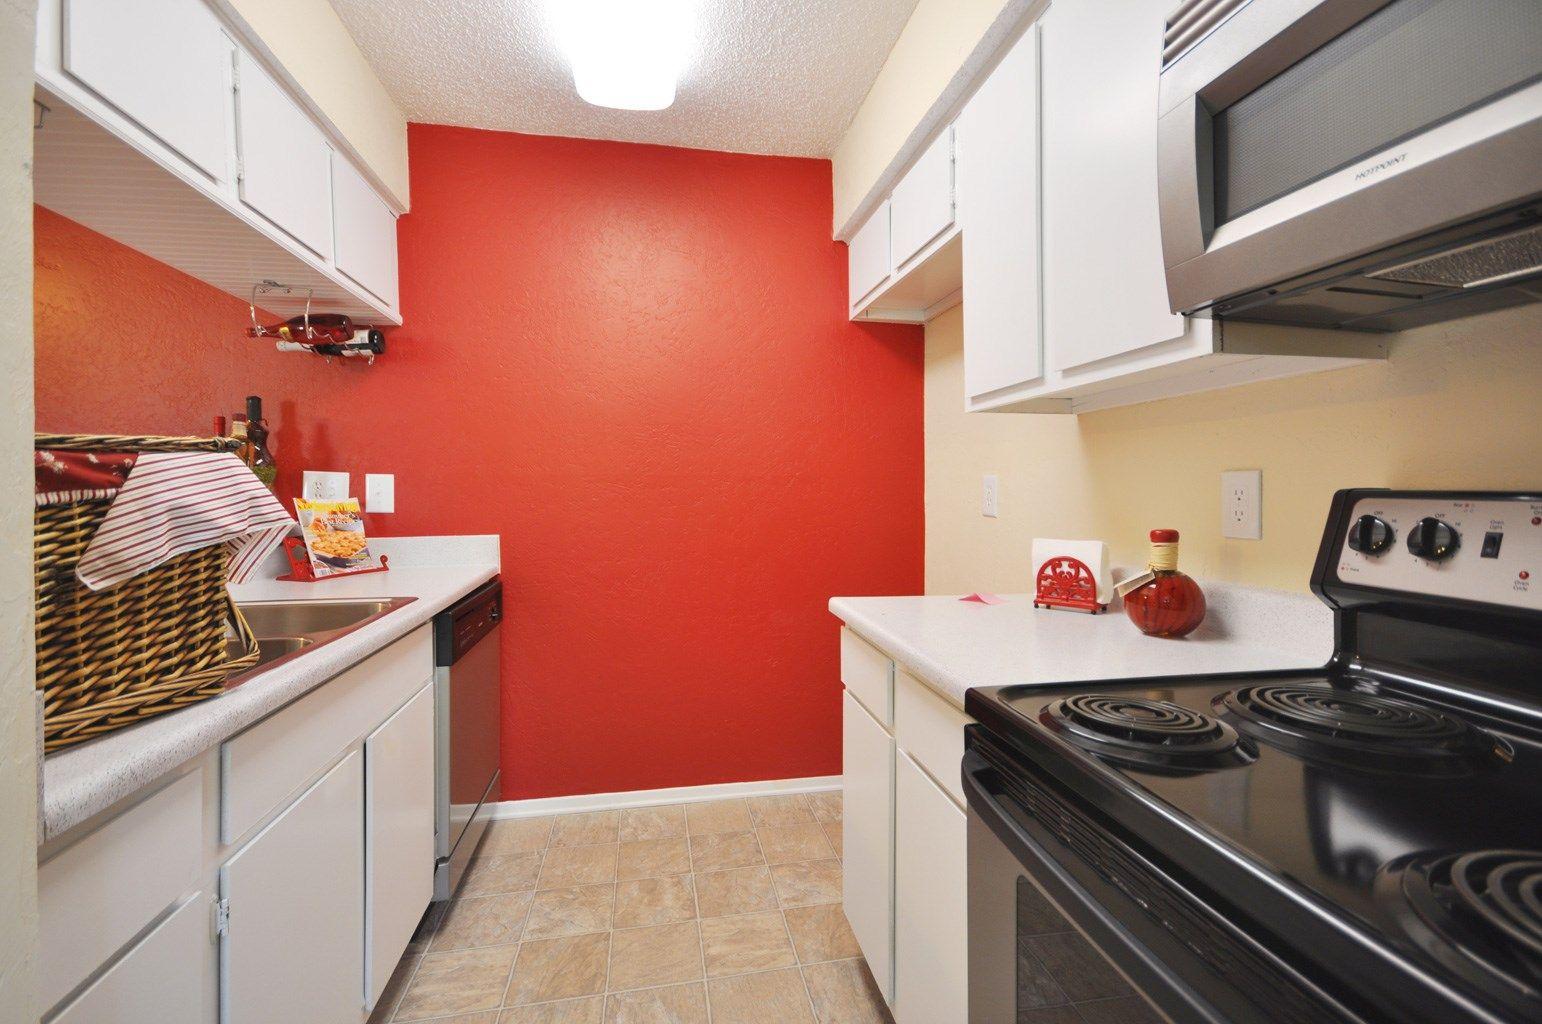 972 596 2919 1 2 Bedroom 1 2 Bath Fairways Apartments 1705 Coit Road Plano Tx 75075 Apartments For Rent Apartment Dallas